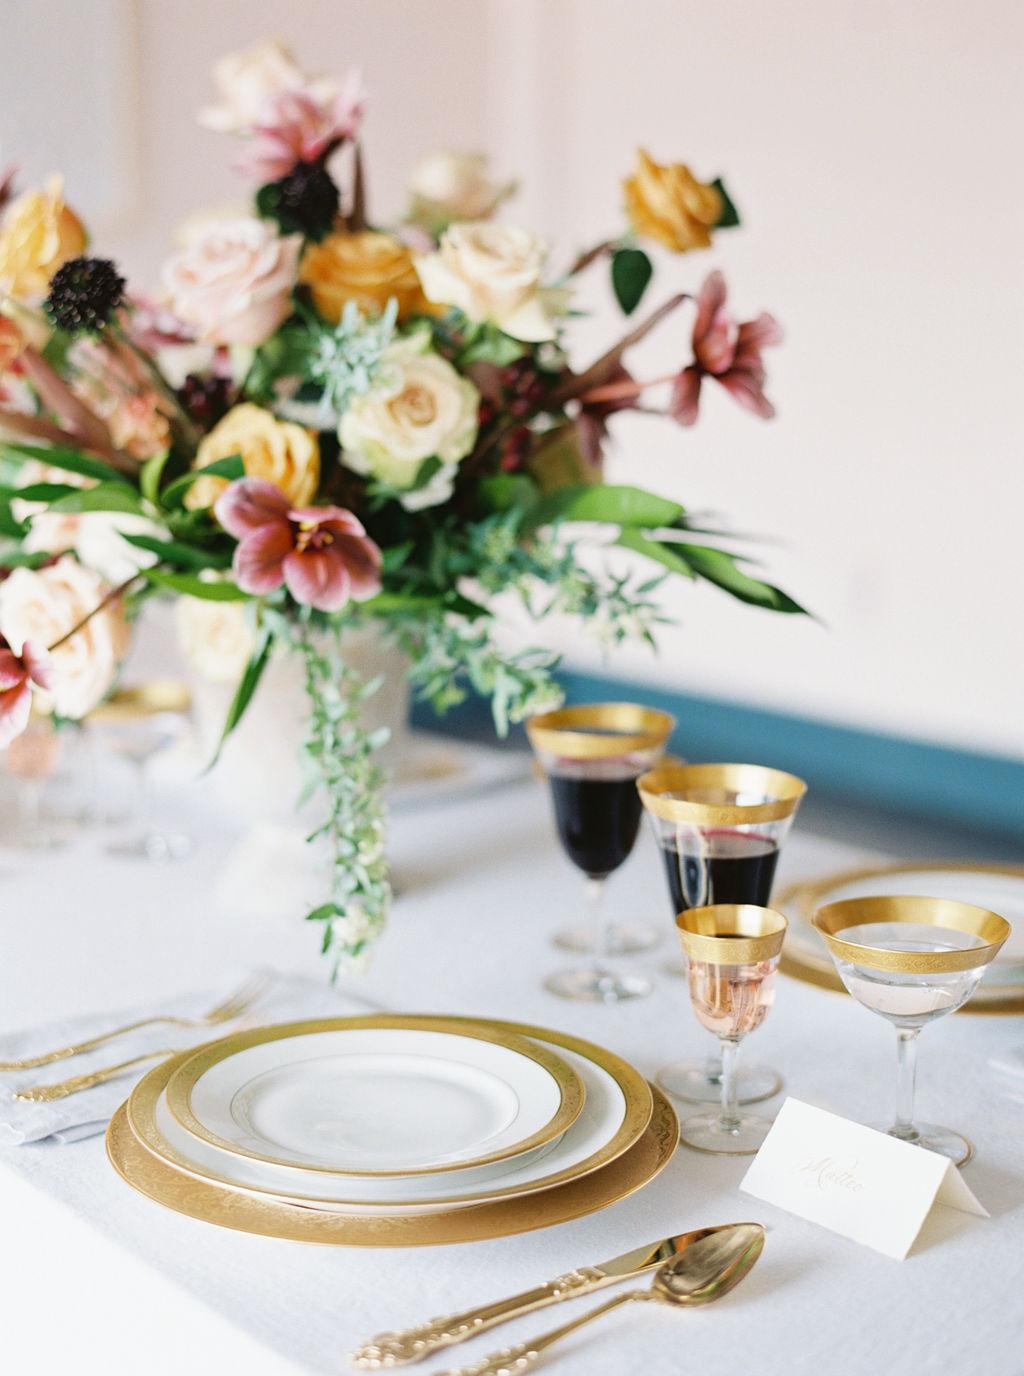 Simple and elegant wedding tablescape idea